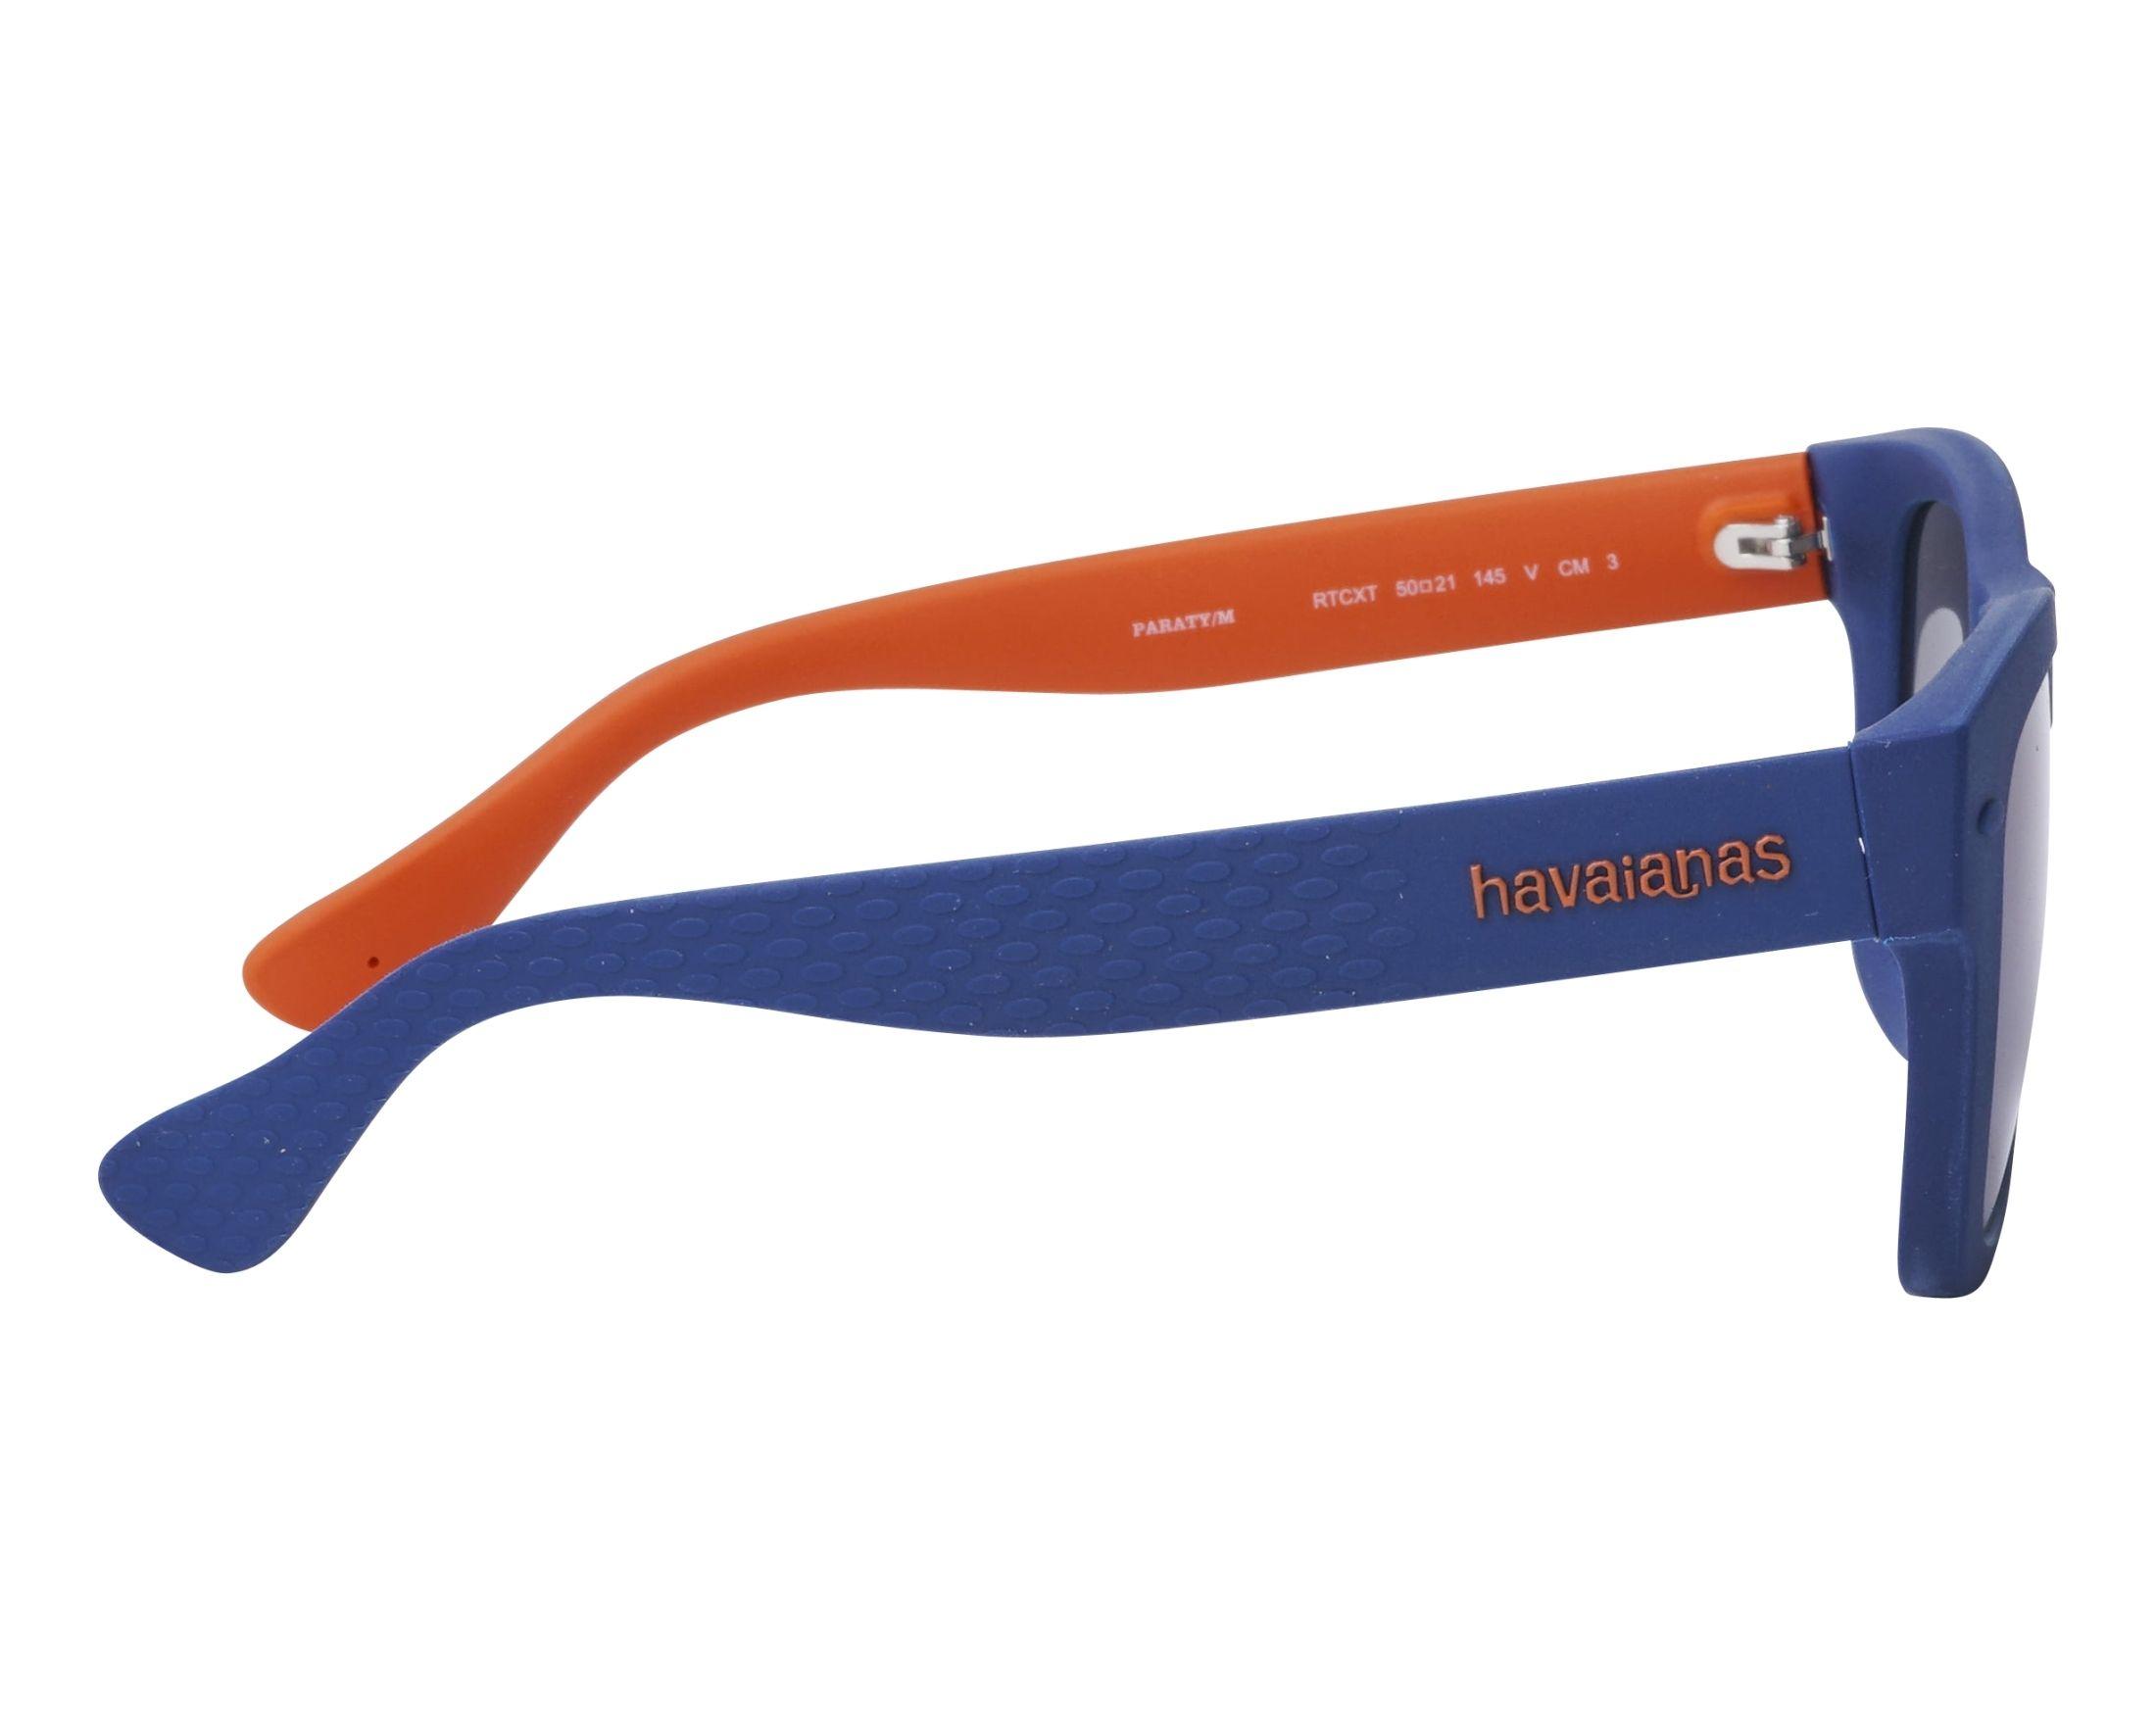 4f5e9e52ff5 Sunglasses Havaianas PARATY-M RTCXT 50-21 Blue Orange side view